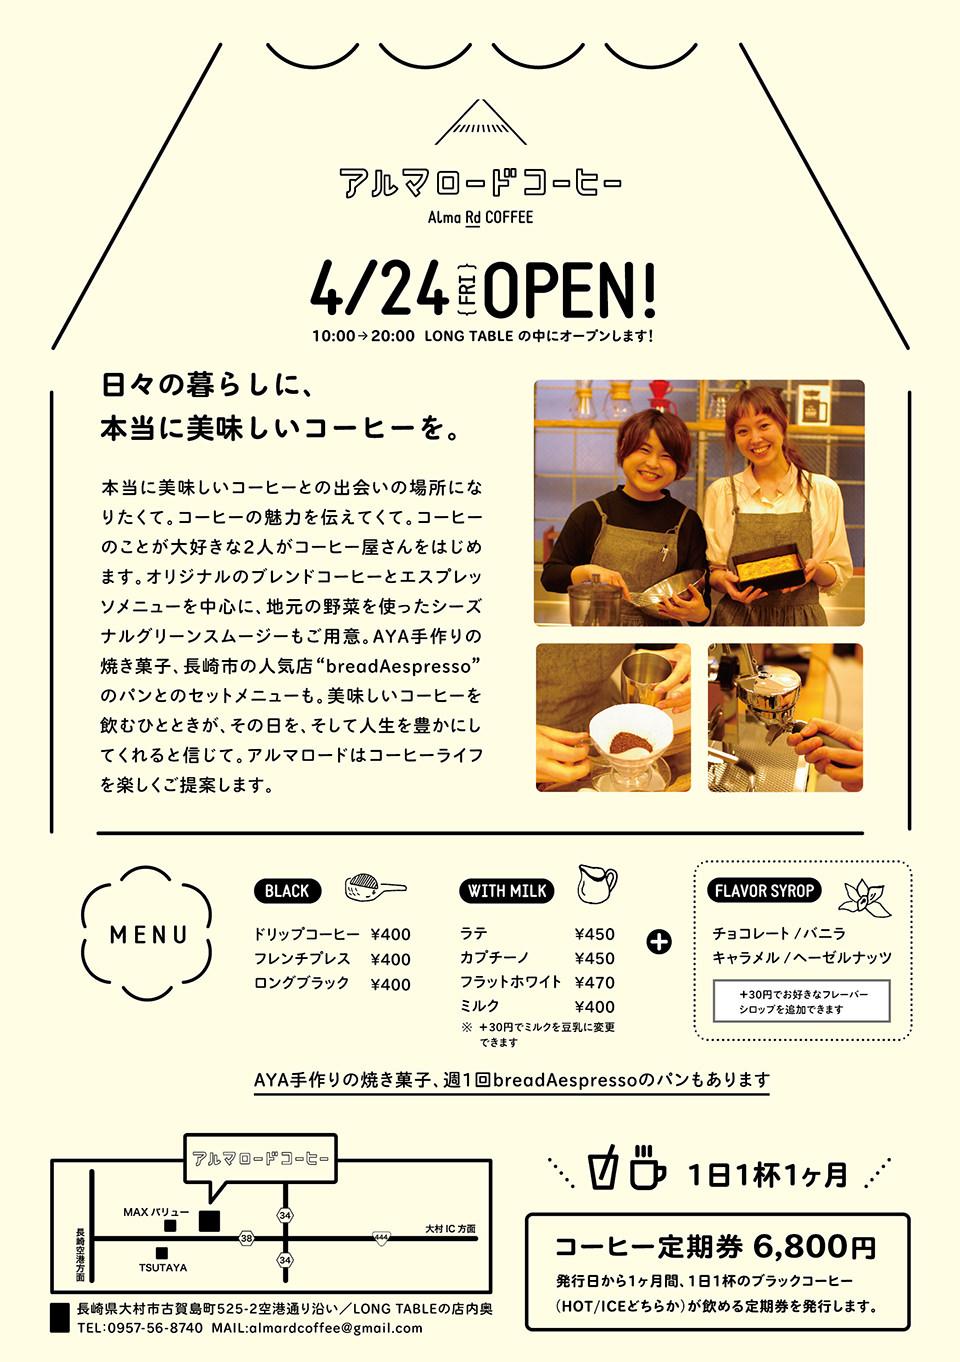 OPEN告知フライヤーのデザイン|アルマロードコーヒー Horns Movie Poster